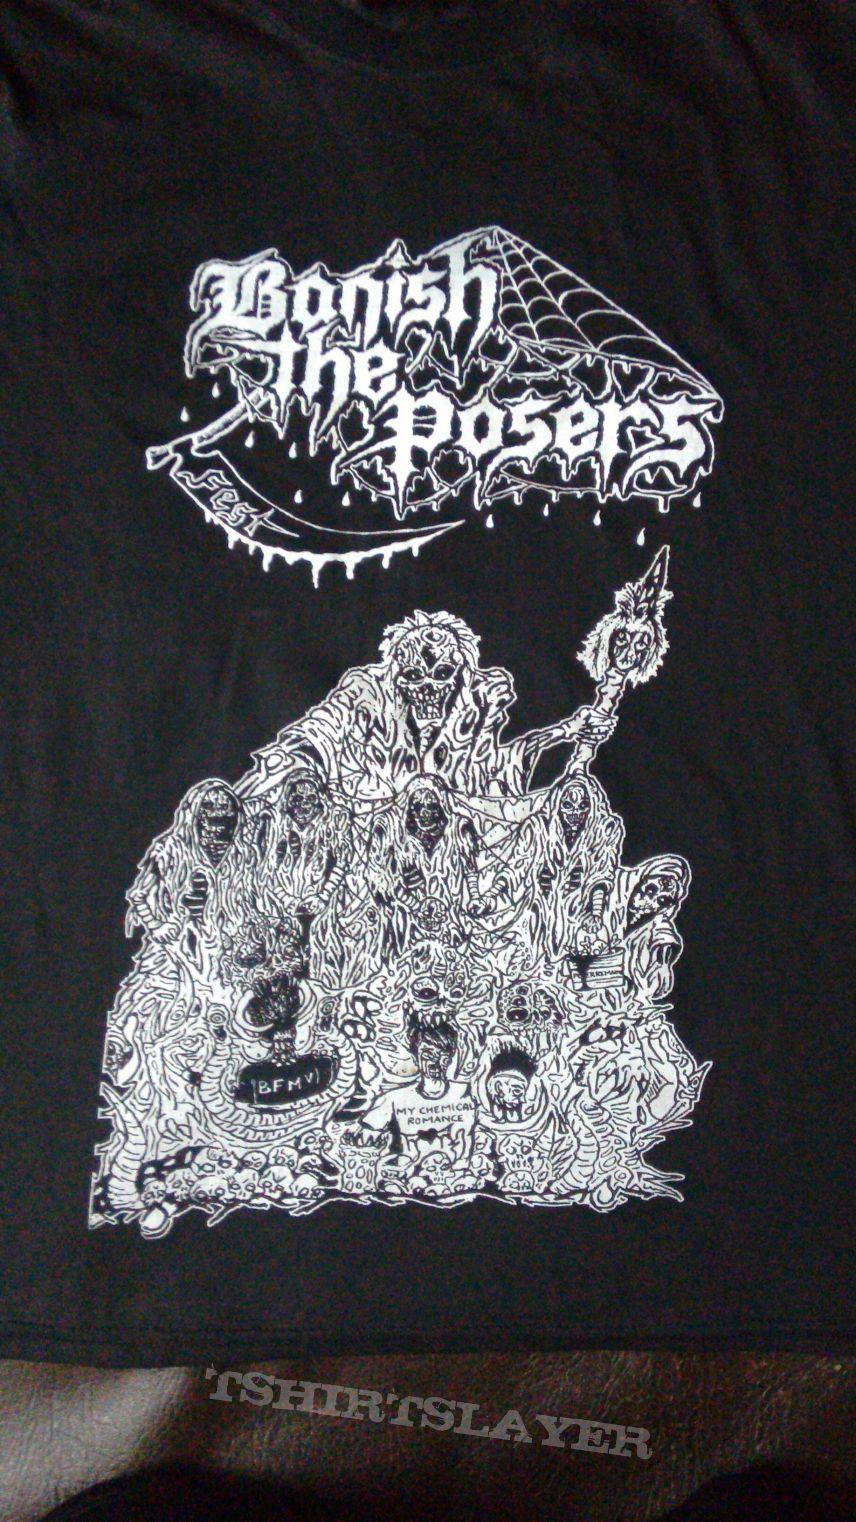 Banish The Posers Fest 2014 Gig T-shirt